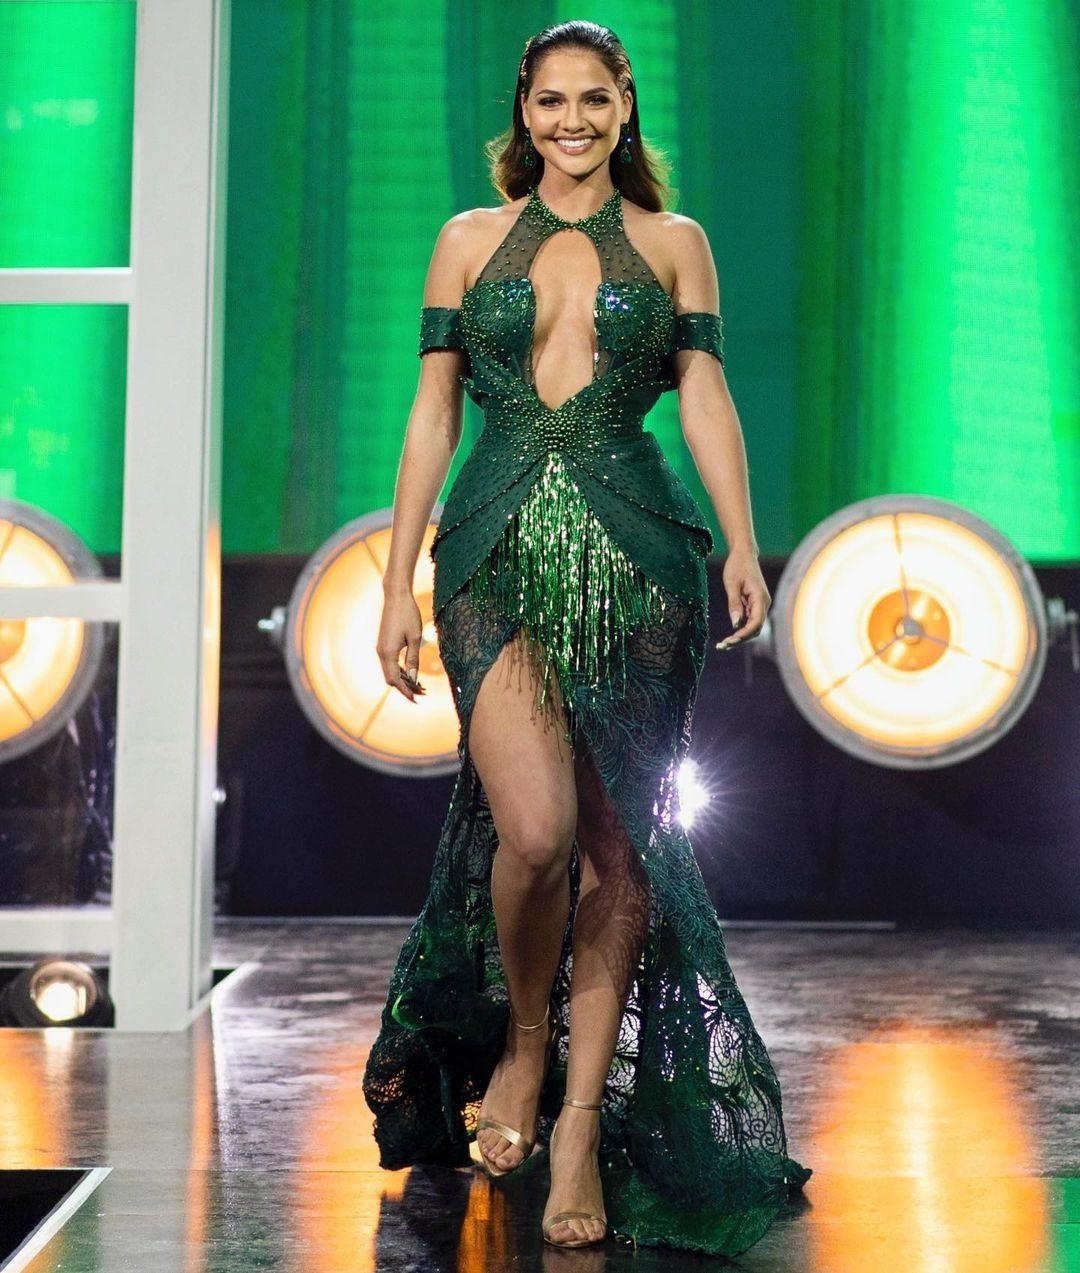 Natasha Joubert Look Facinating In Emerald Green